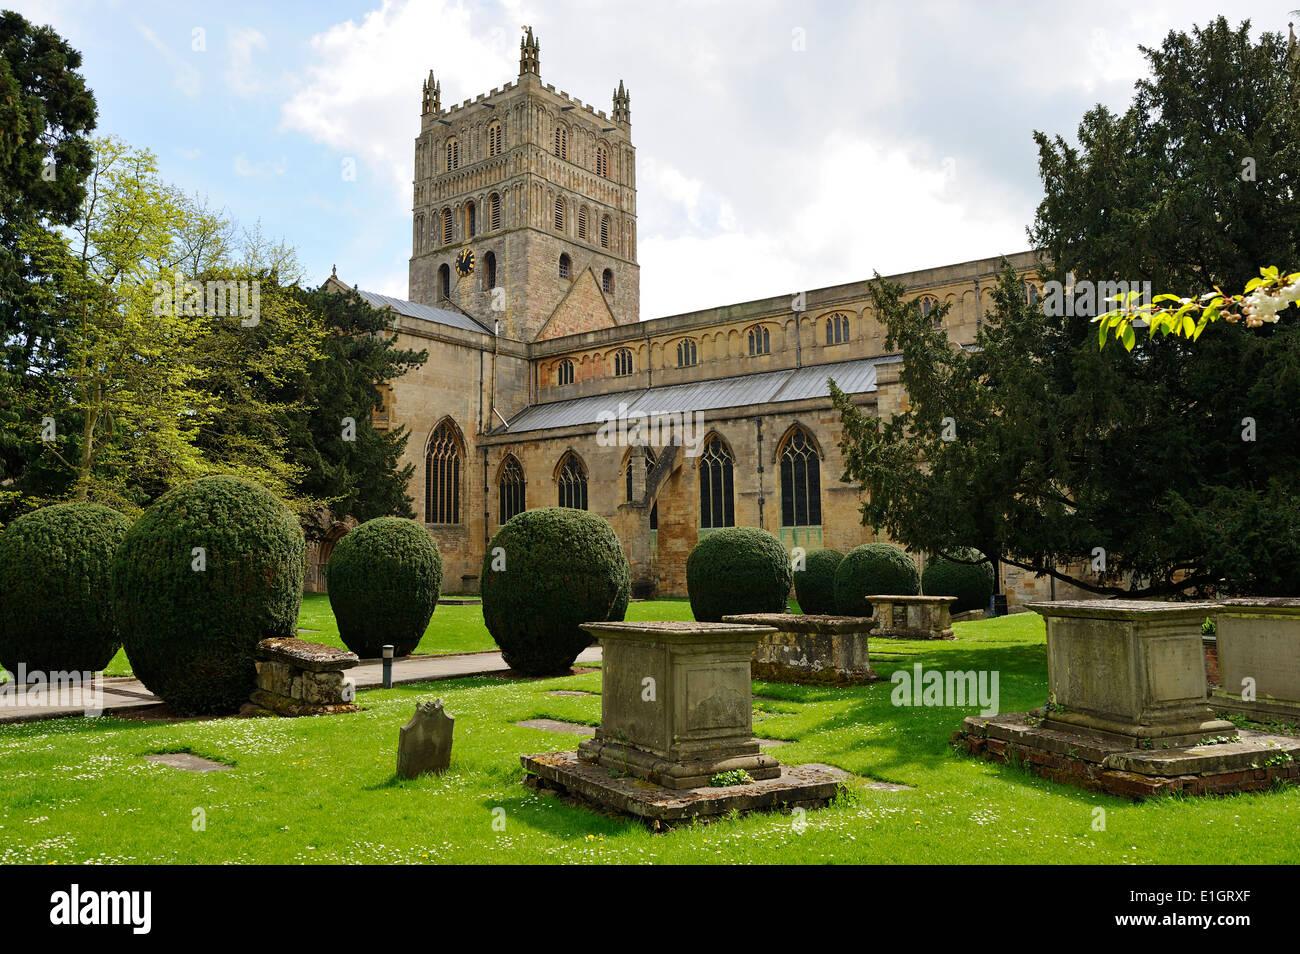 Tewkesbury Abbey, Gloucestershire, England - Stock Image